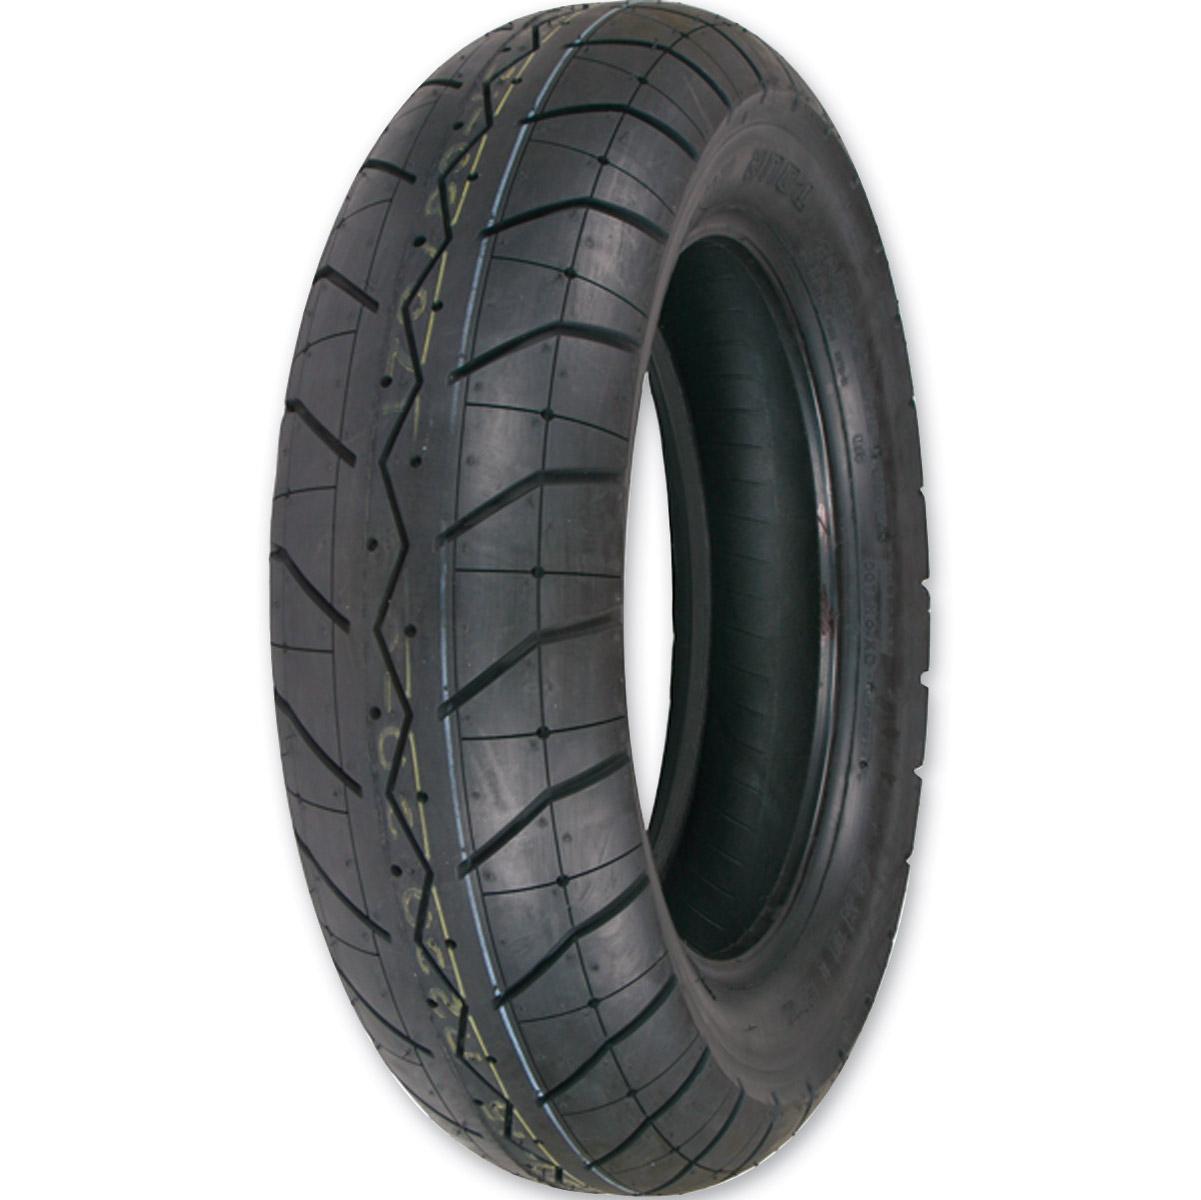 Motorcycle Rear Tire >> Shinko 230 Tour Master 170 80 15 Rear Tire 87 4177 Jpcycles Com